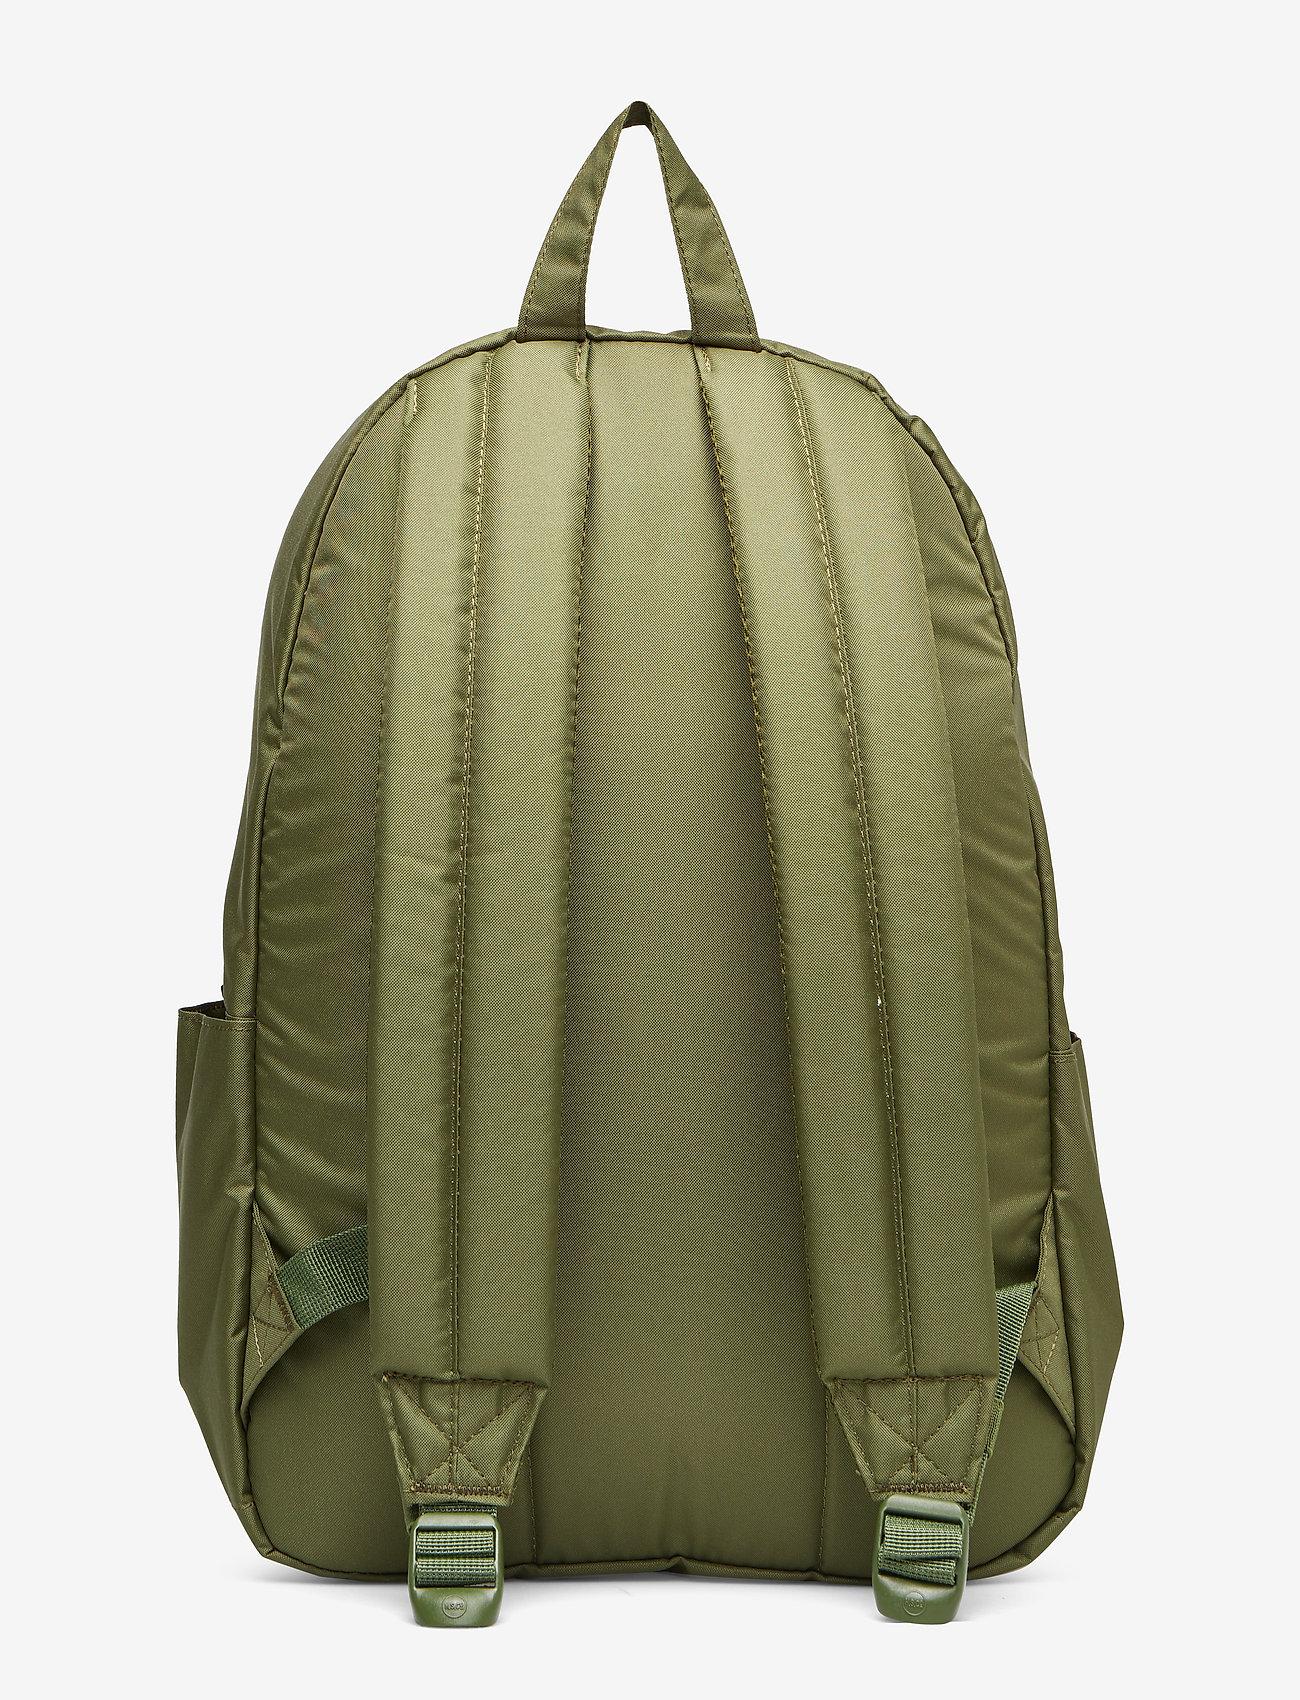 Herschel Classic X-large - Bags